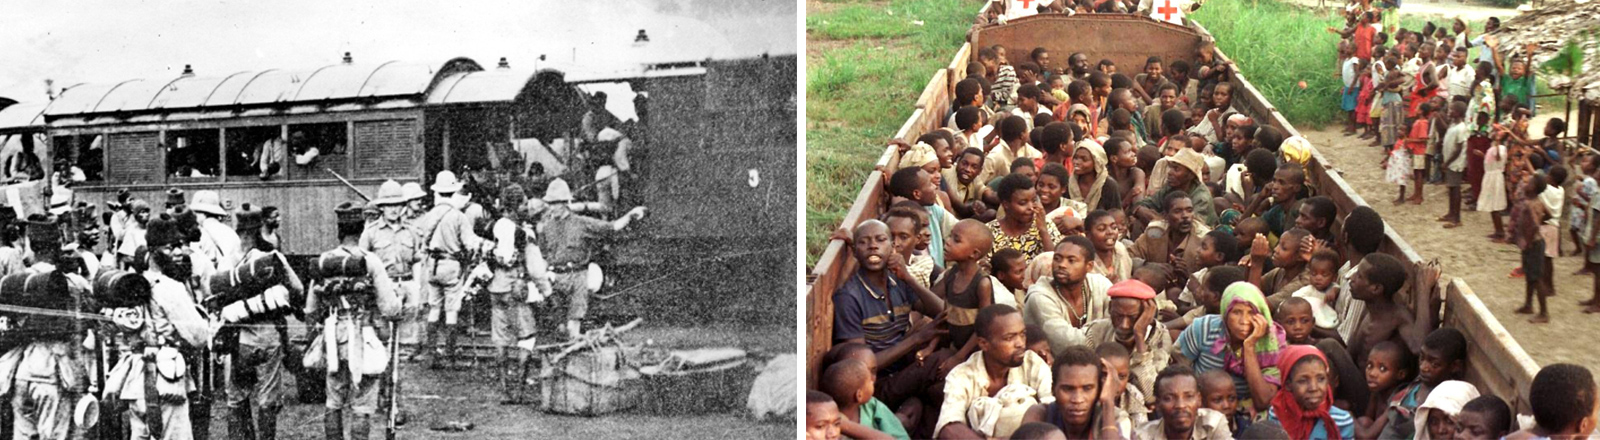 Deutsche Armee in Ostafrika während dem 1. Weltkrieg. Ruandische Flüchtlinge 1997